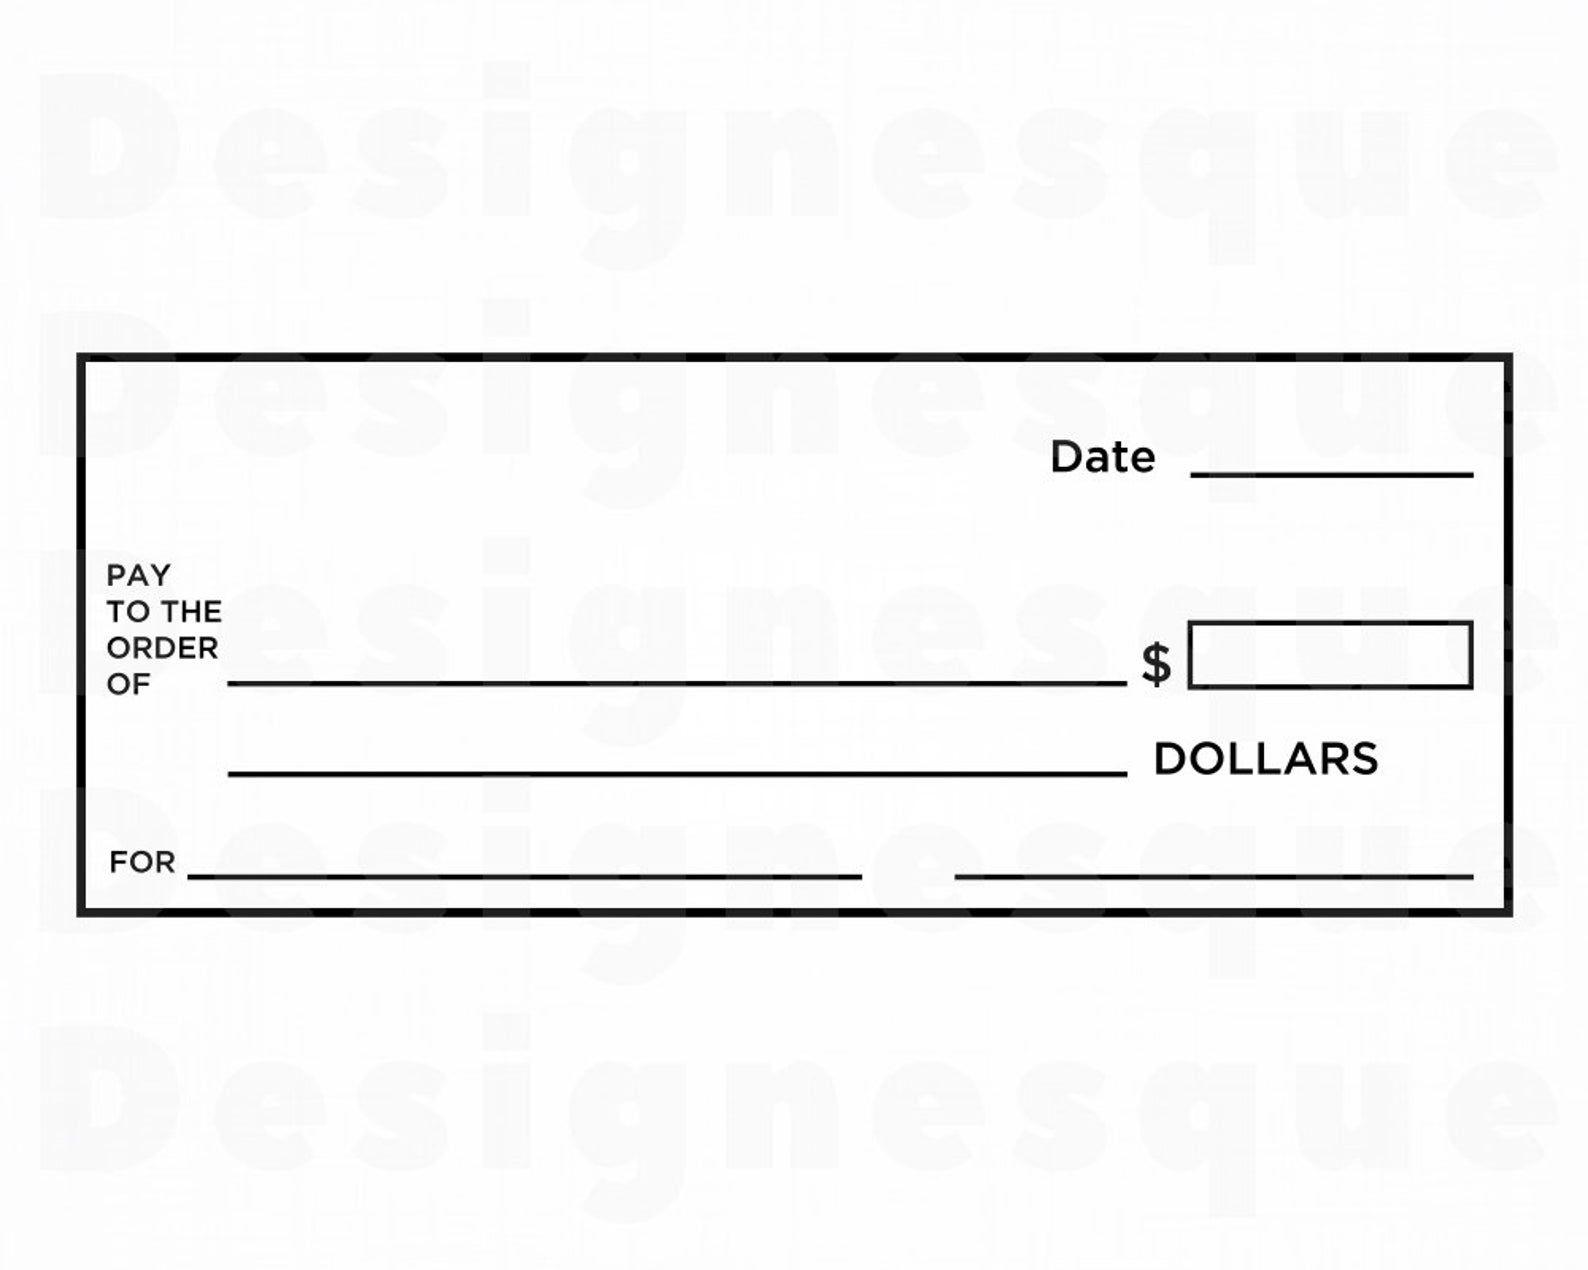 Check Template Svg Blank Check Svg Bank Account Svg Money Etsy In 2021 Money Template Blank Check Printable Checks